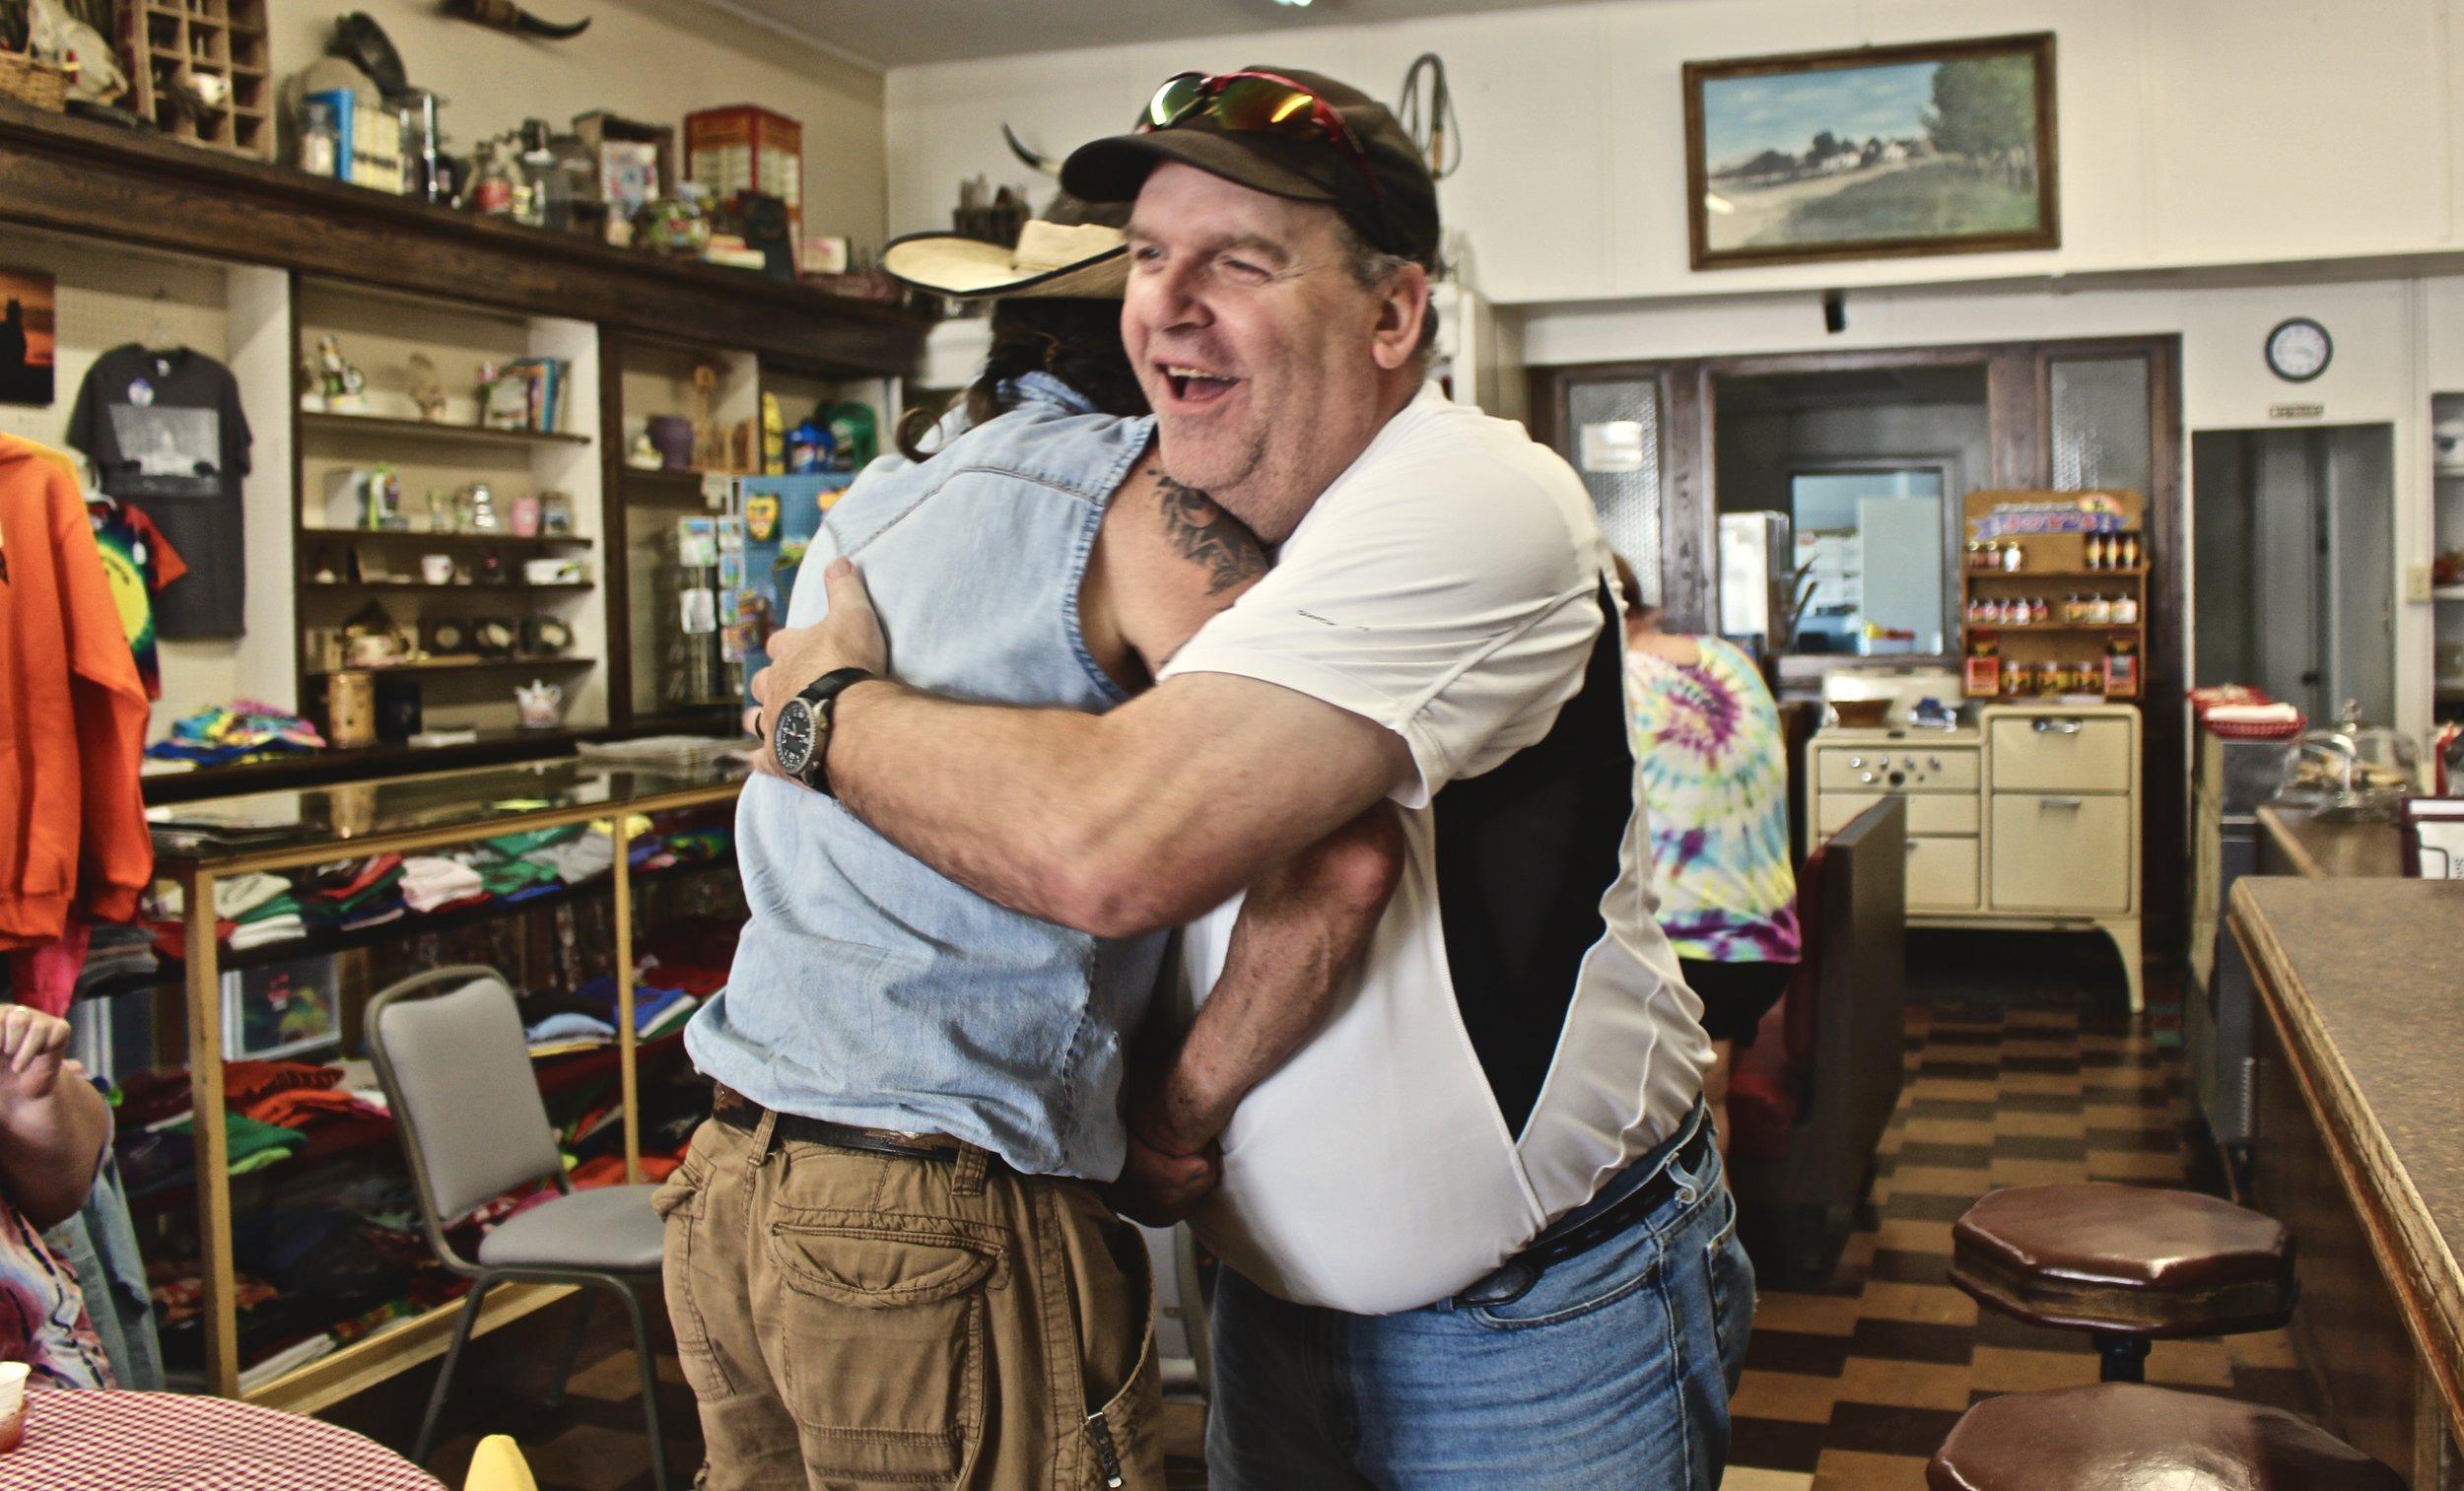 Bob and Jimmy hug hello after a long time apart